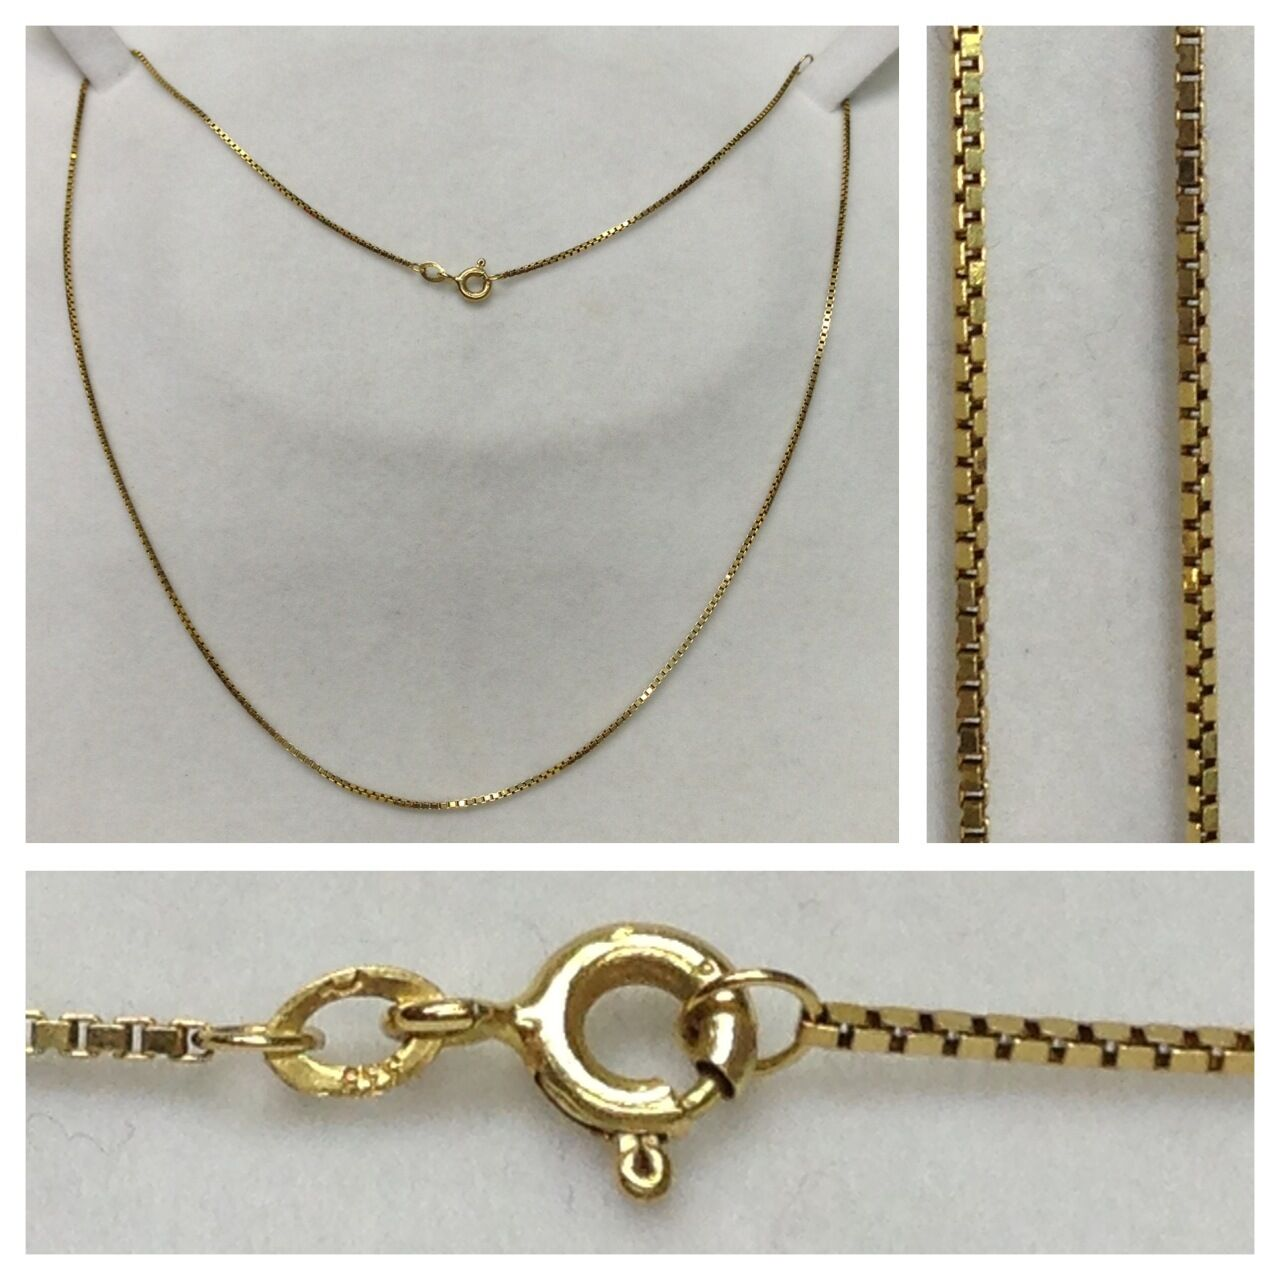 Cadena Veneciana Collar 333 gold Collar de gold cadena de gold Joya De gold 45cm